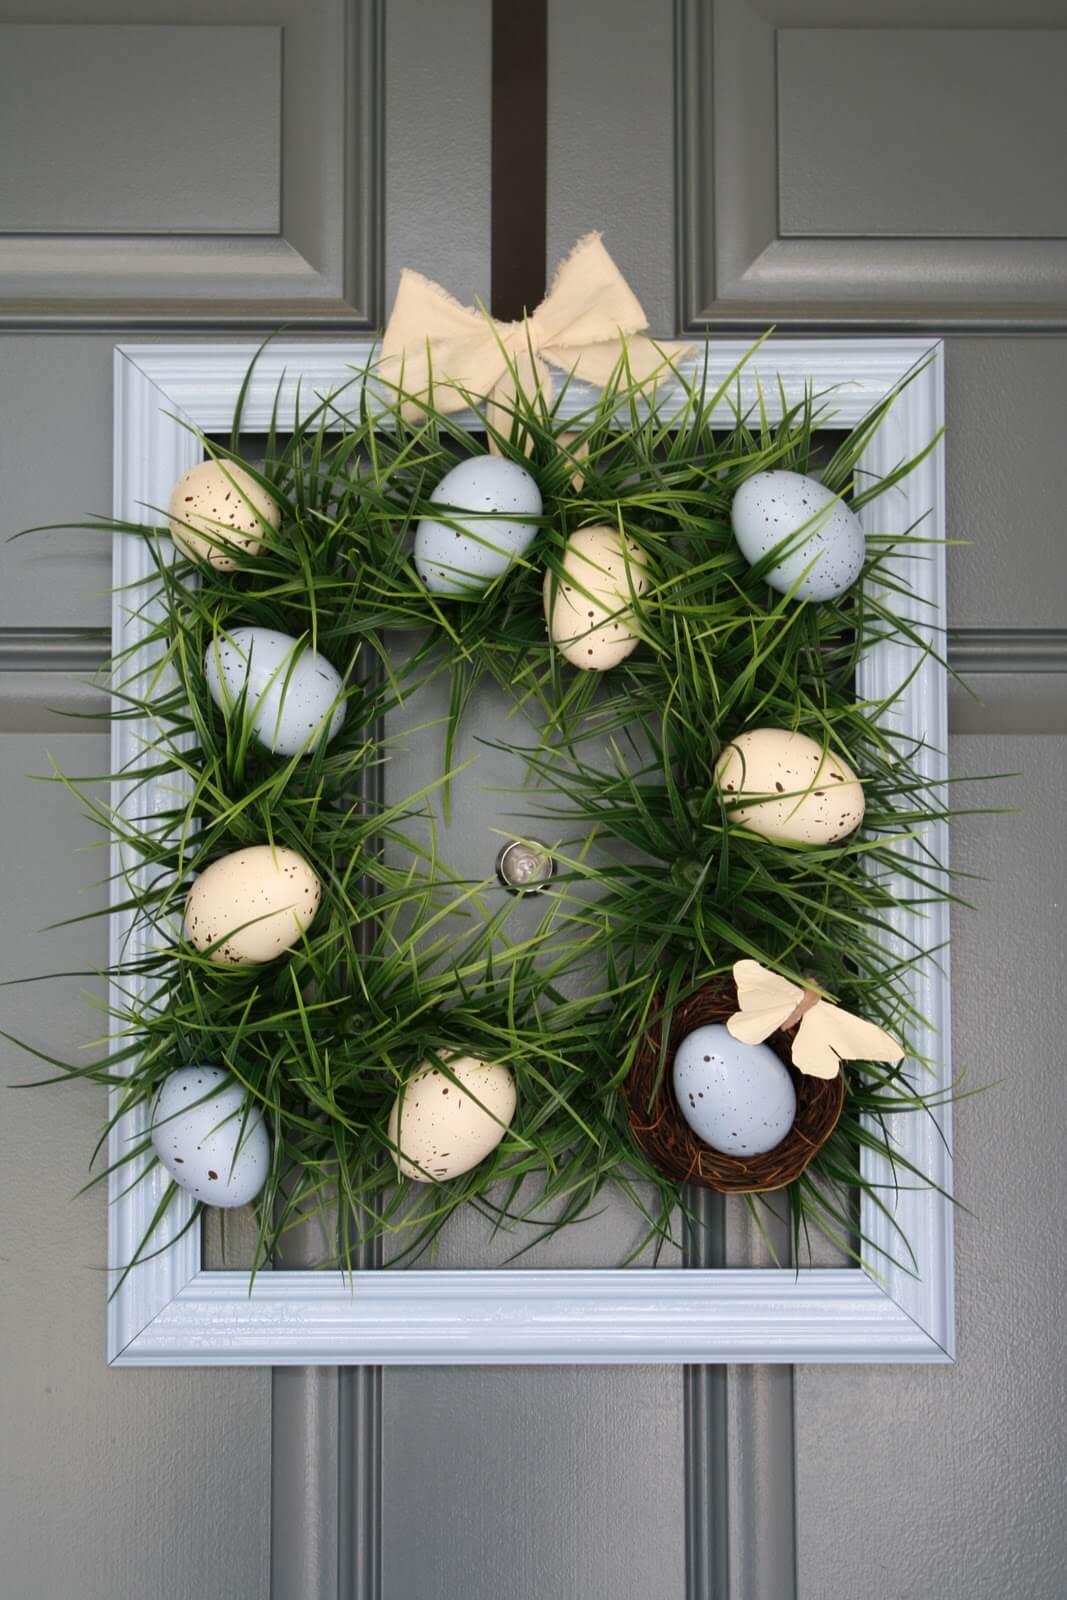 08-easter-wreath-ideas-homebnc